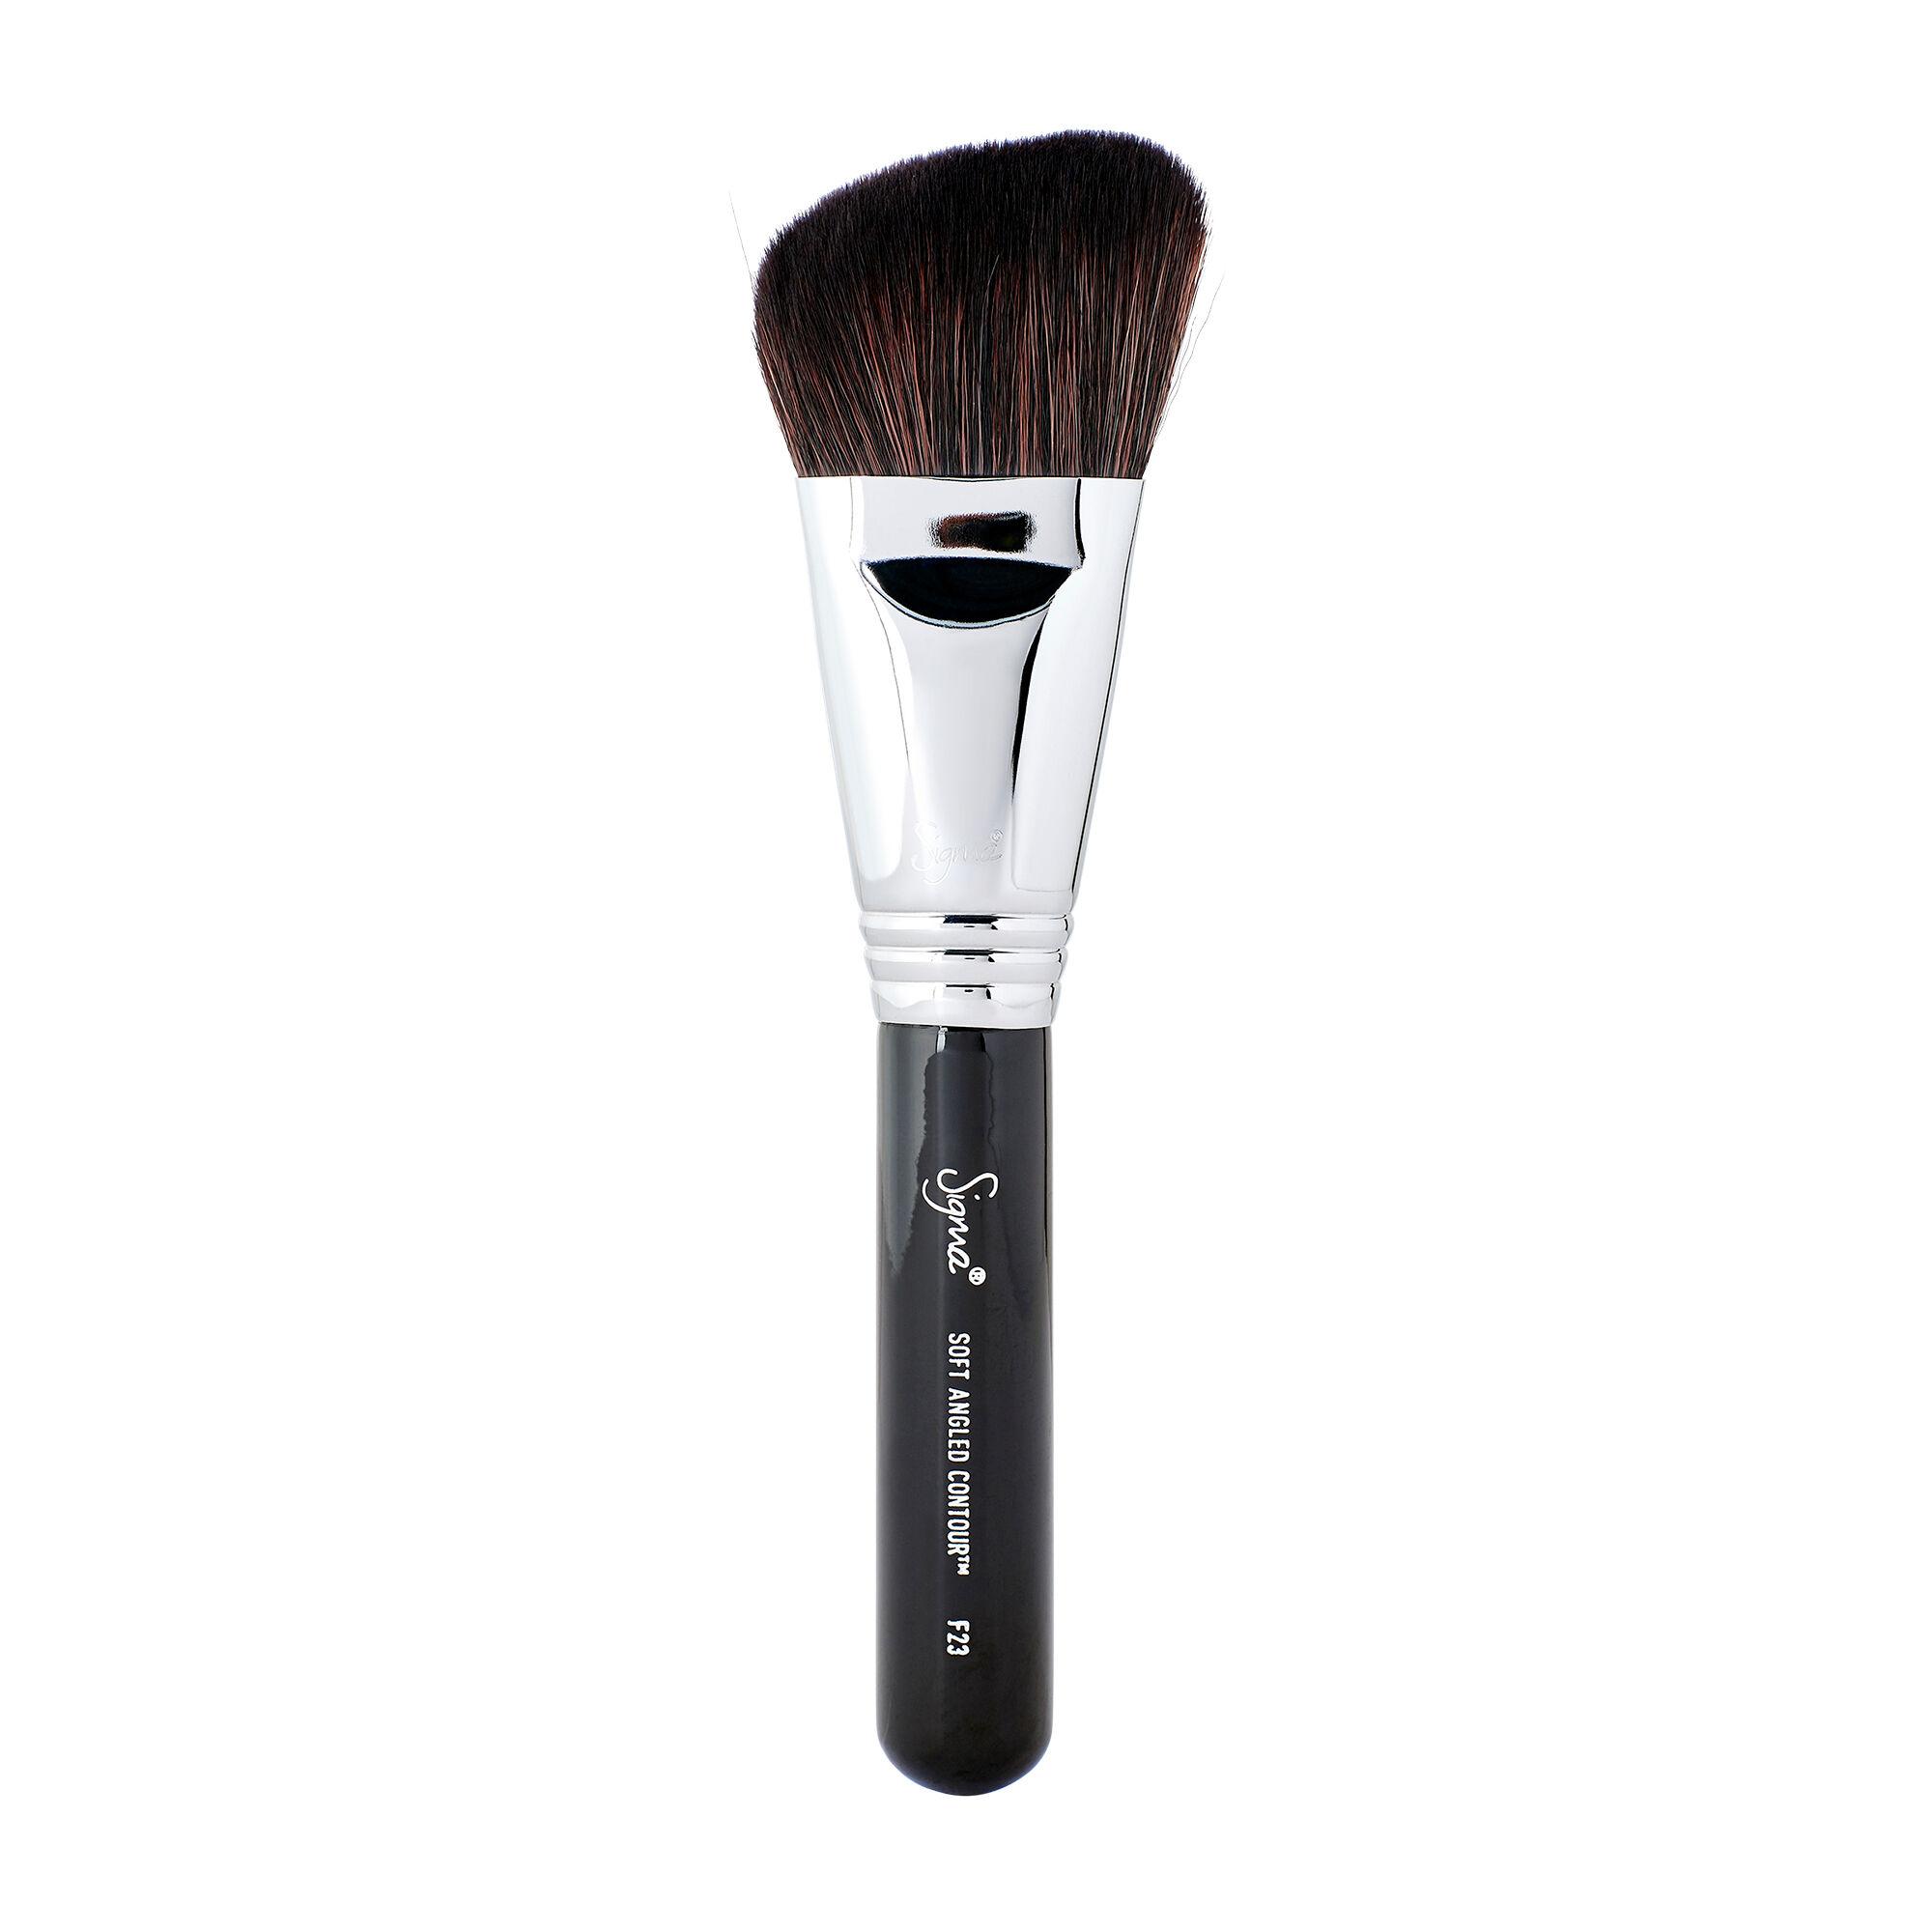 Sigma Beauty F23 Soft Angle Contour Brush